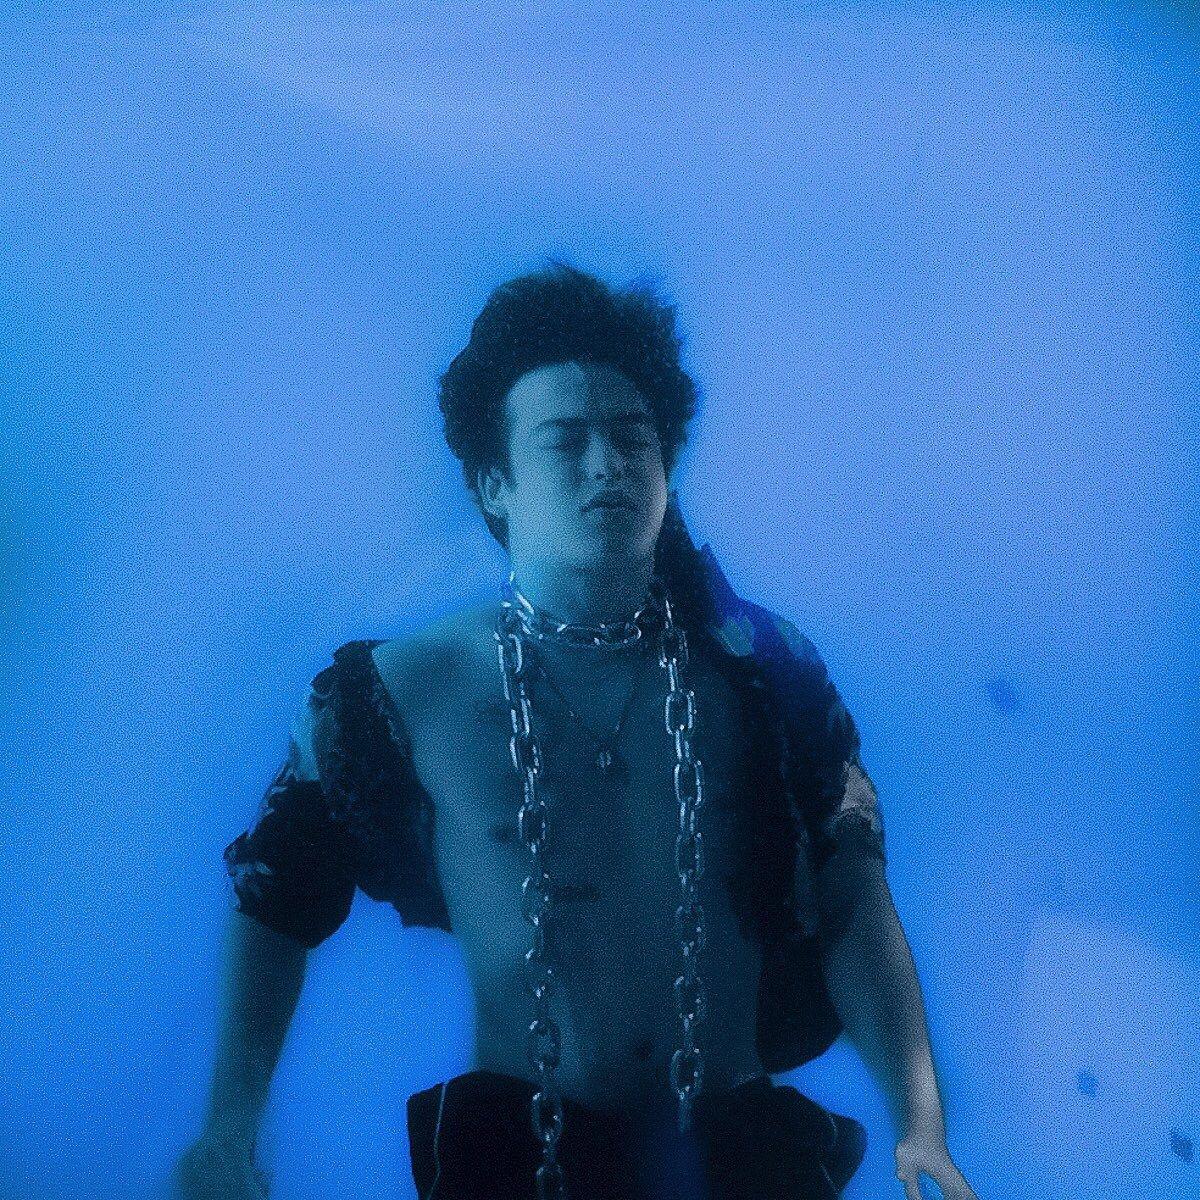 Joji in tongues album review music album cover cool